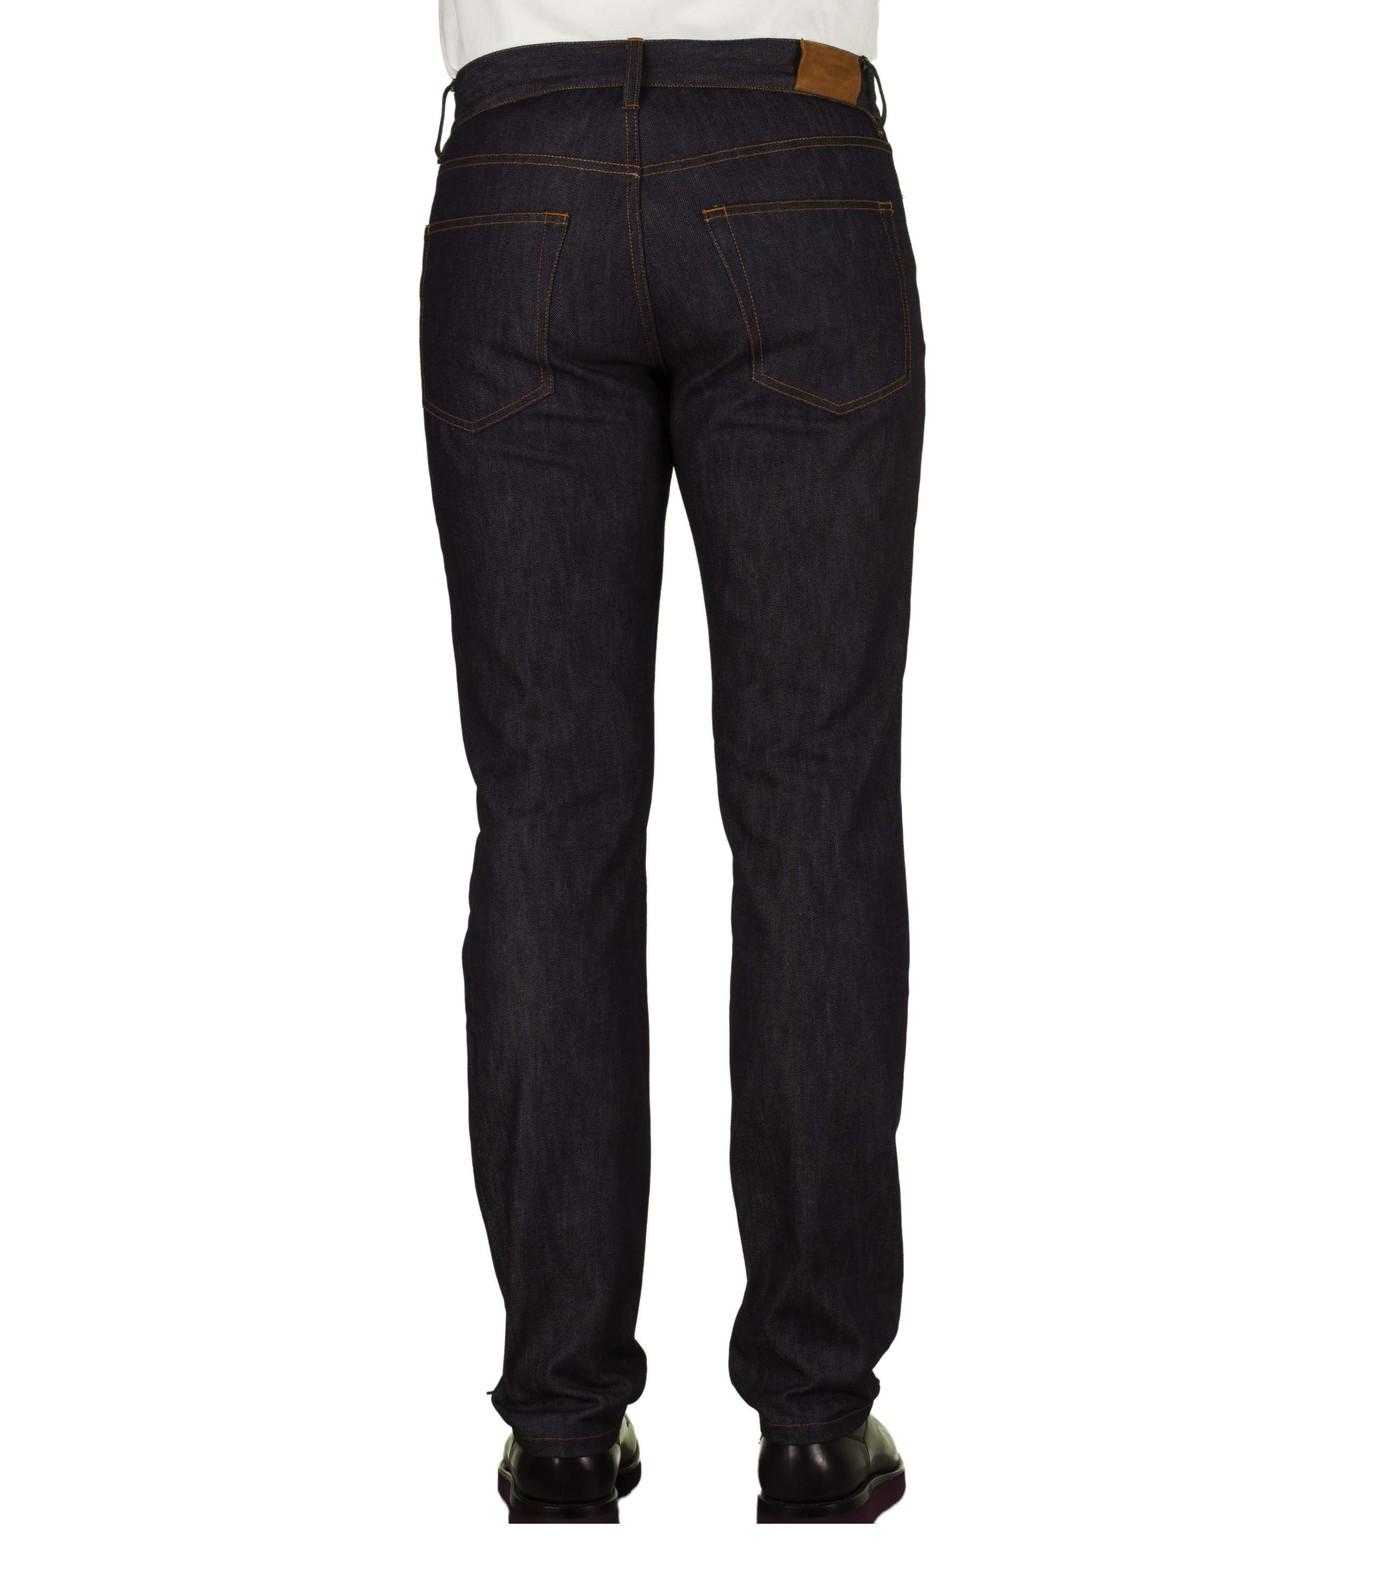 Pantalon GN. Denim - Brut